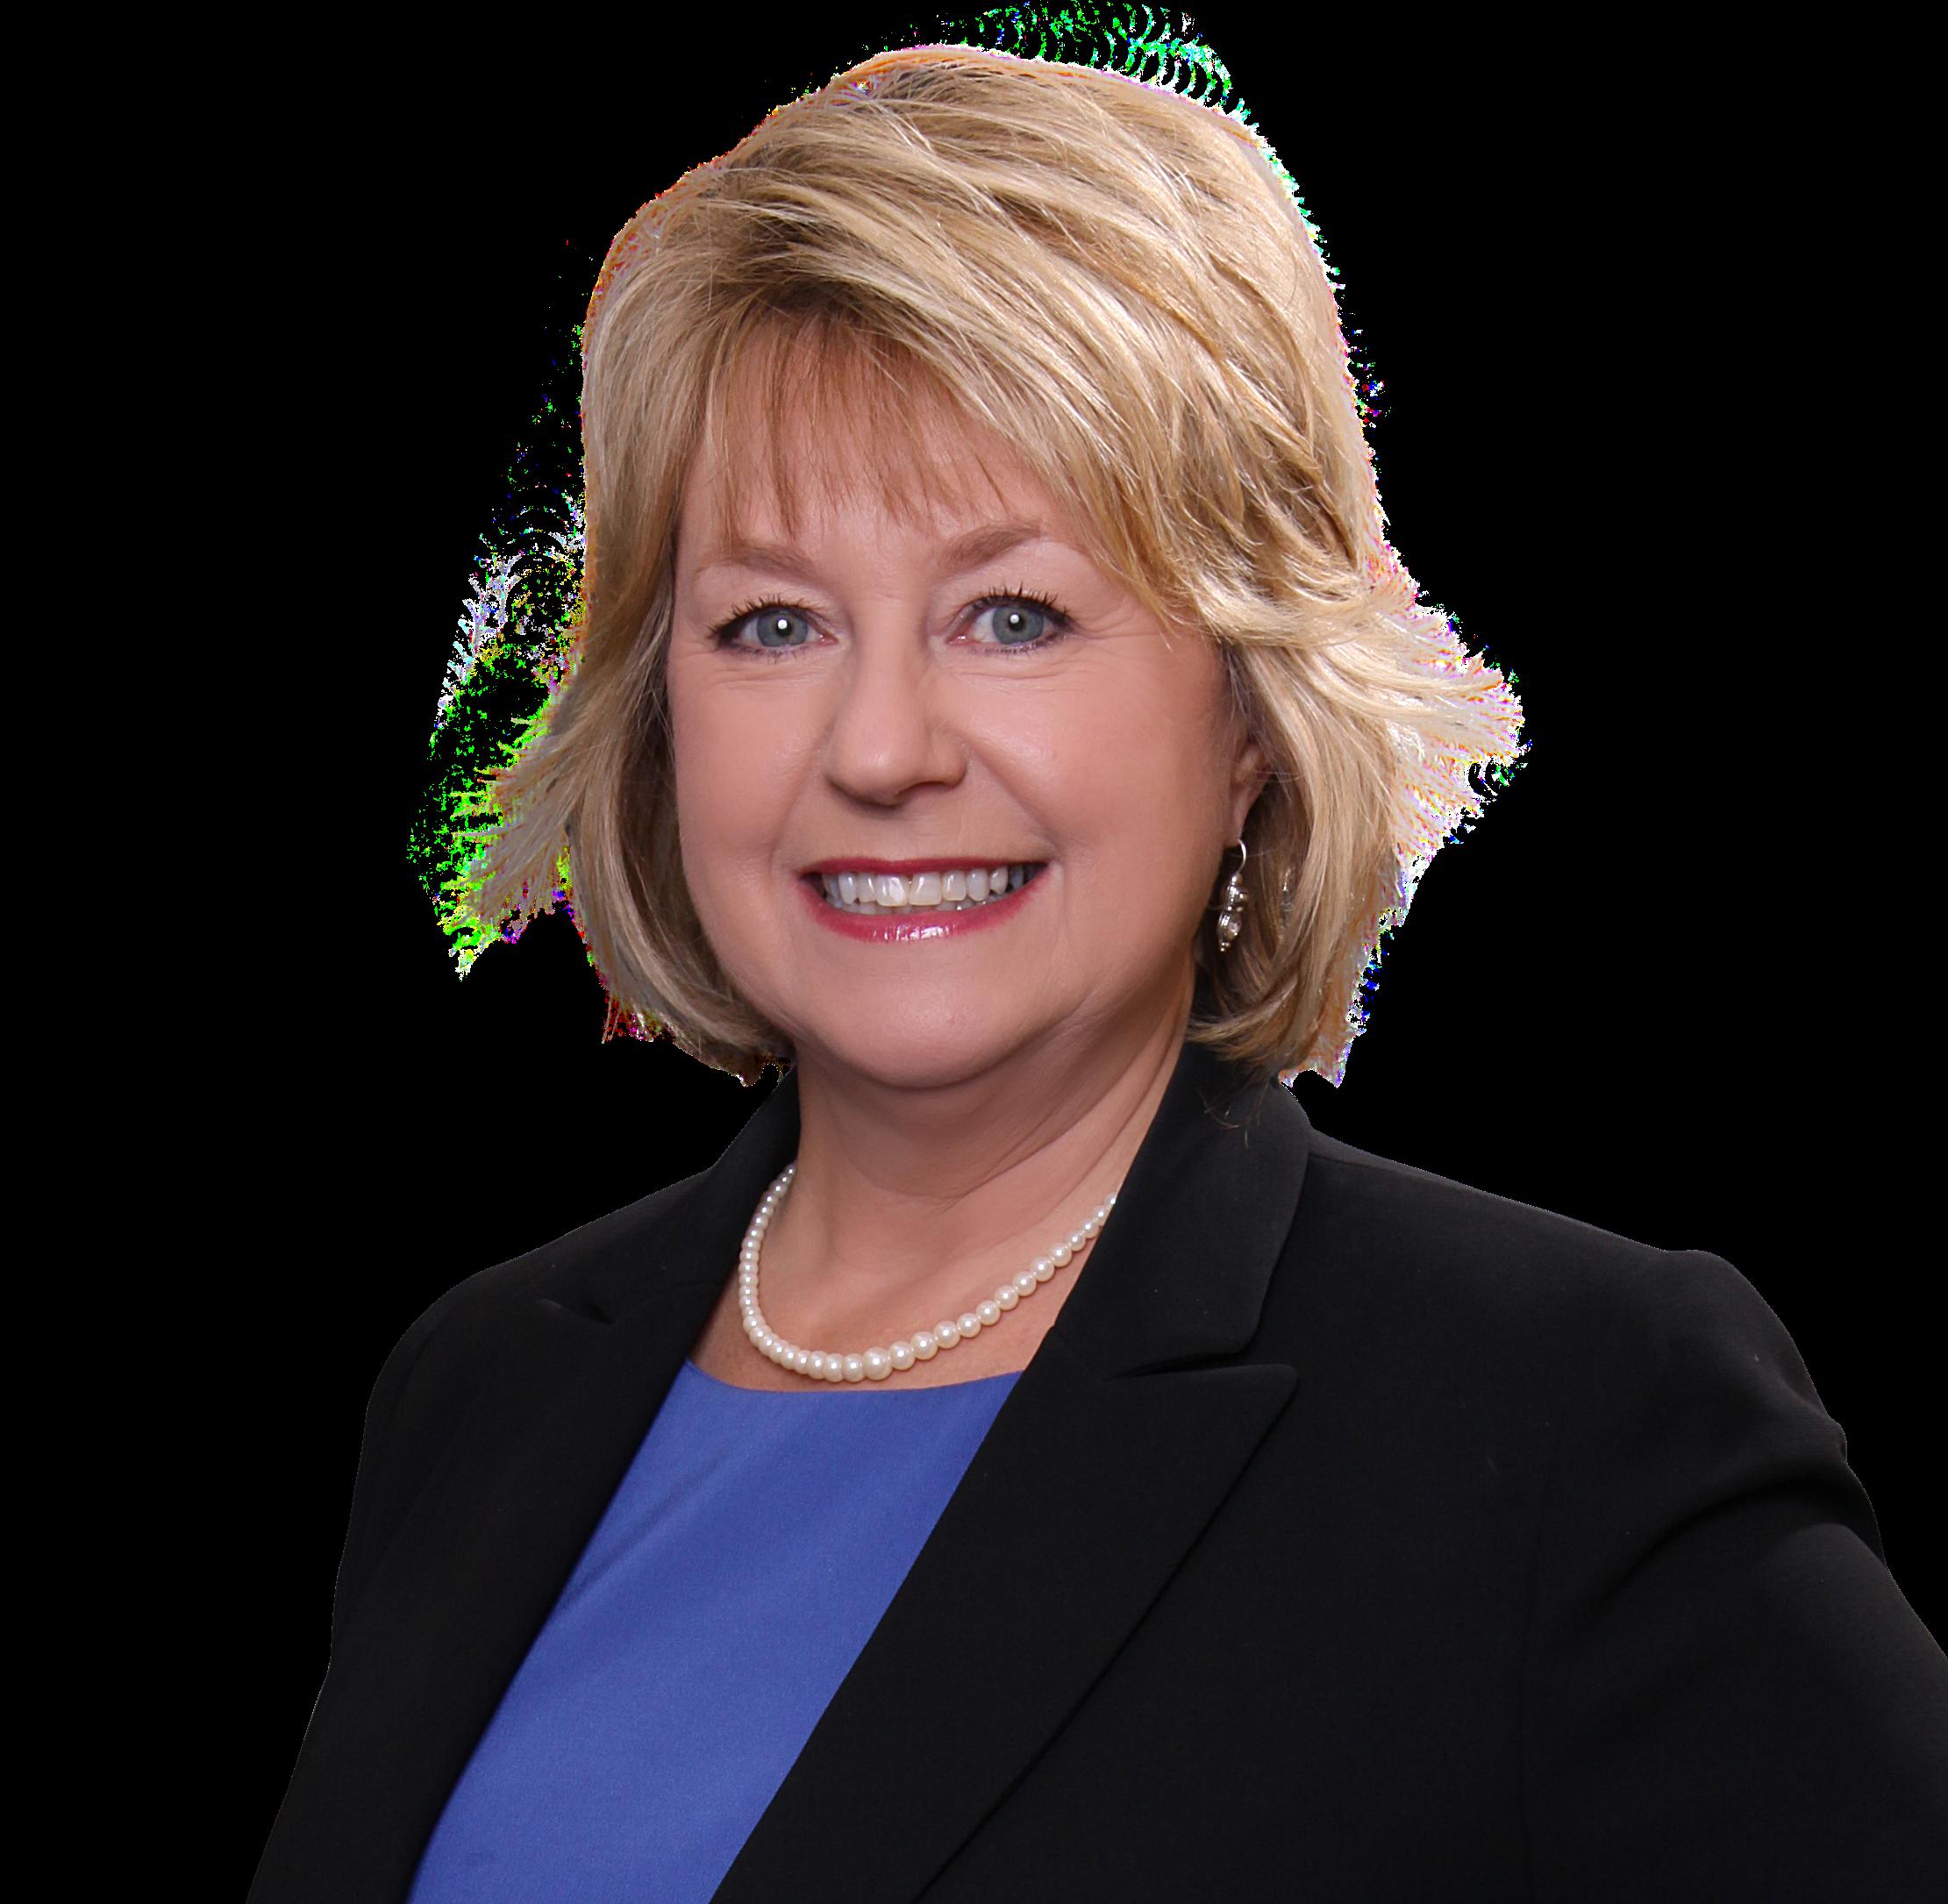 Kathy Venable - Southwest